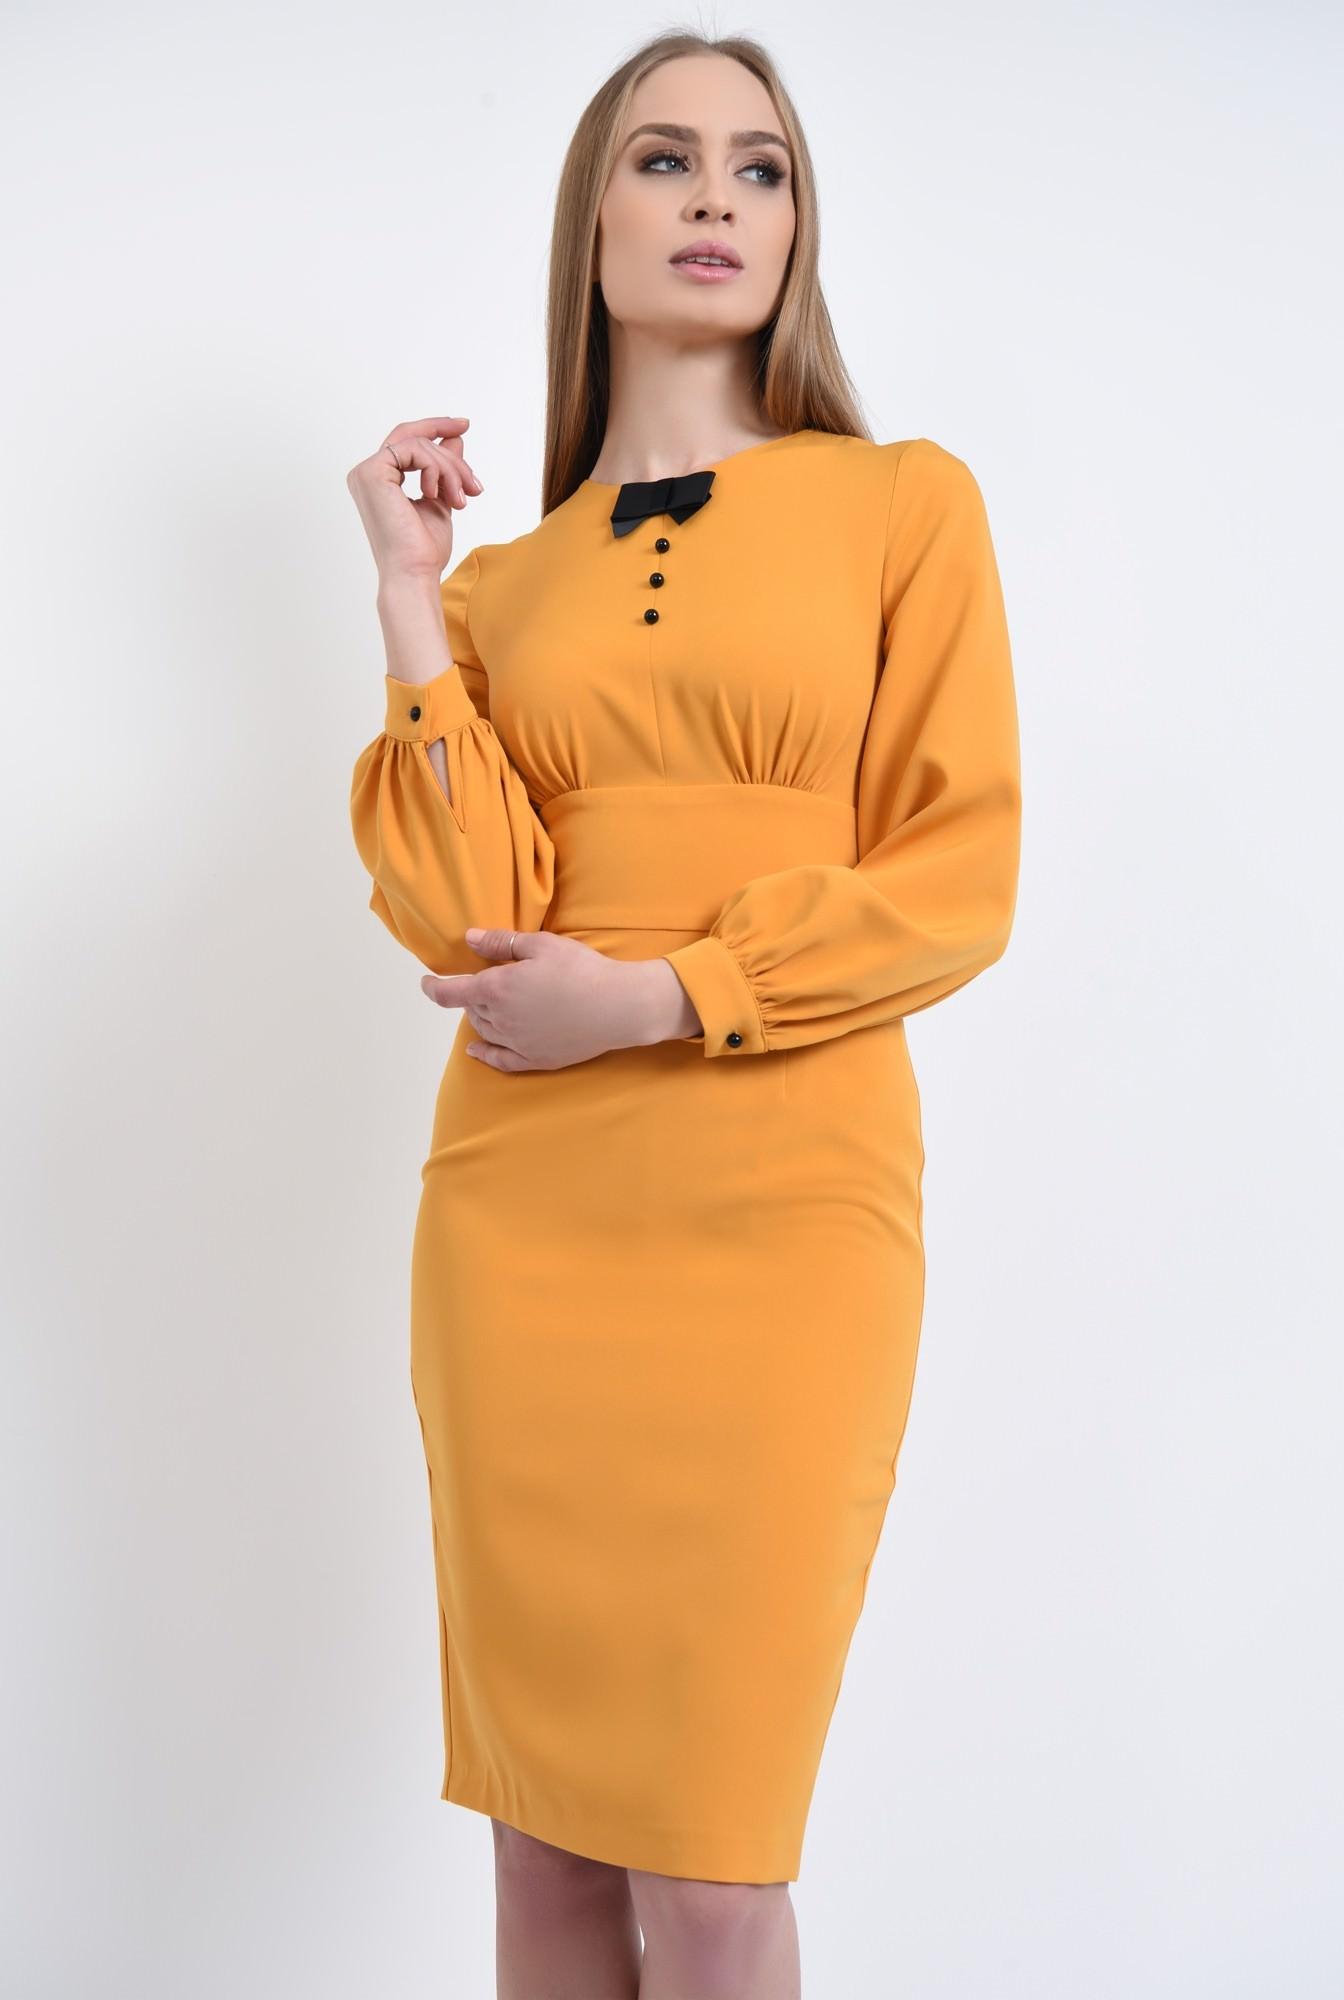 0 - 360 - rochie conica, maneci bufante, mansete, rochii online, funda, nasturi, contrast